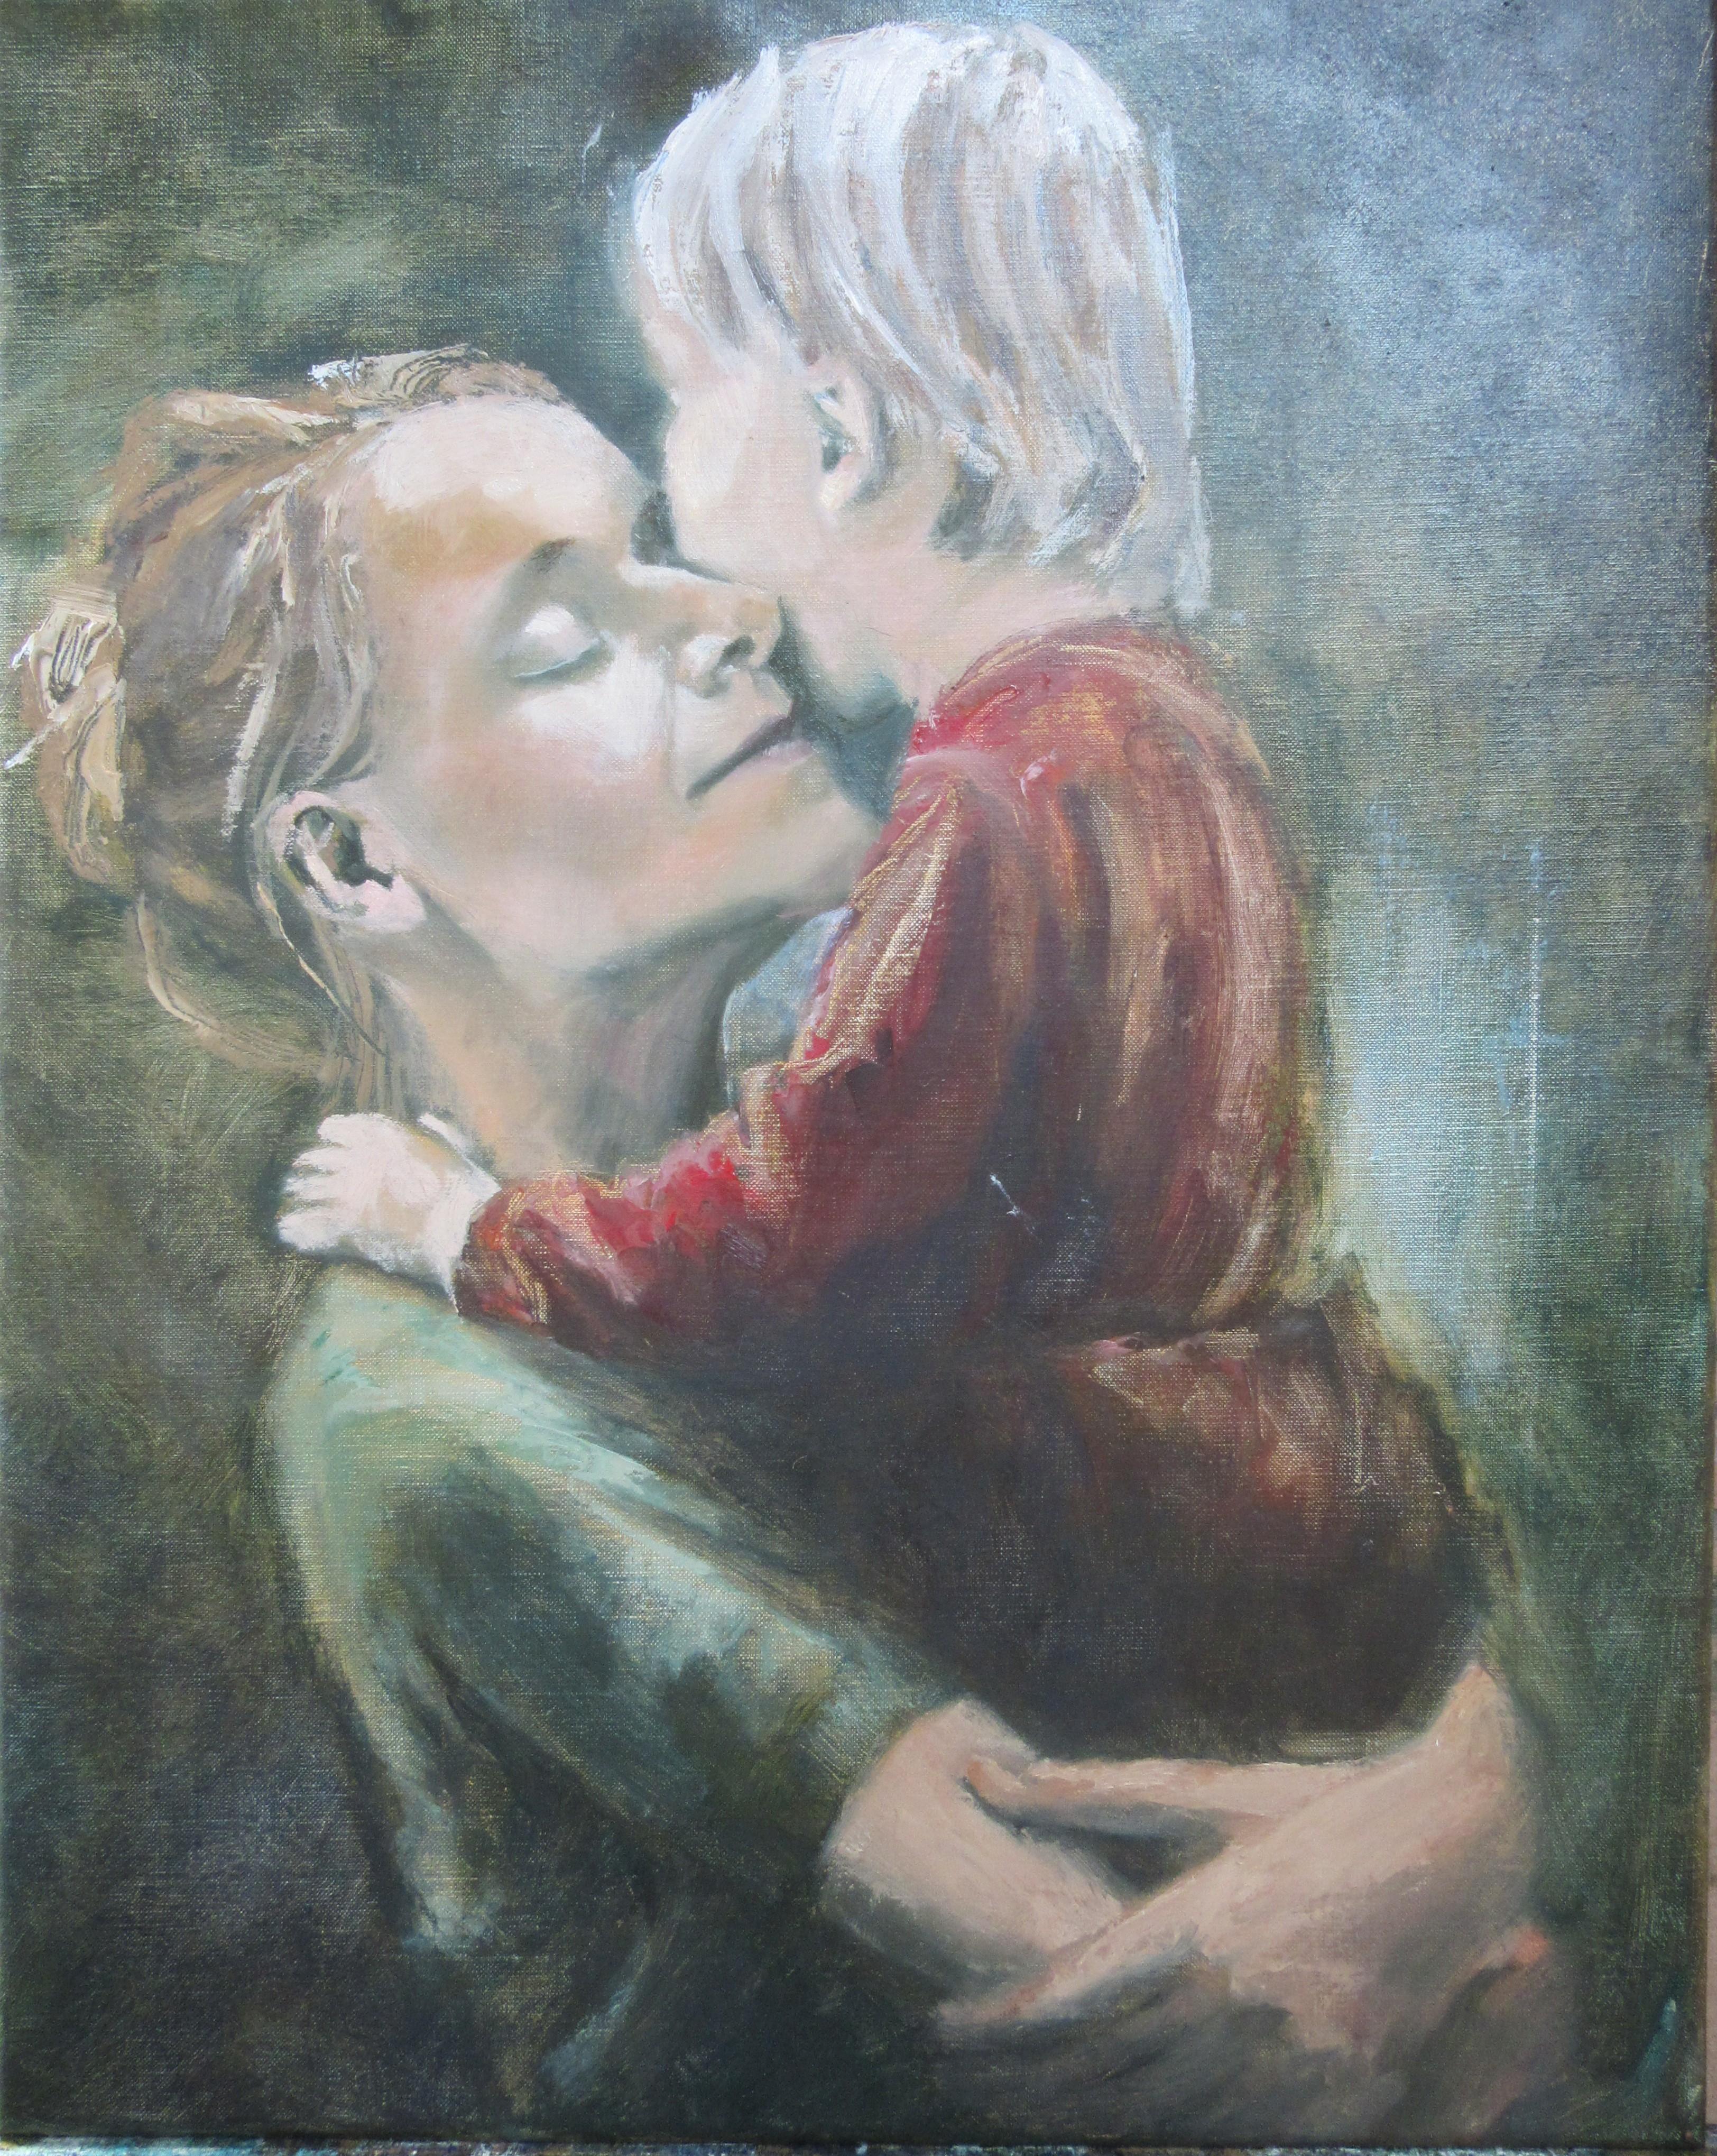 Portret schilderen in olieverf, zo doe ik dat